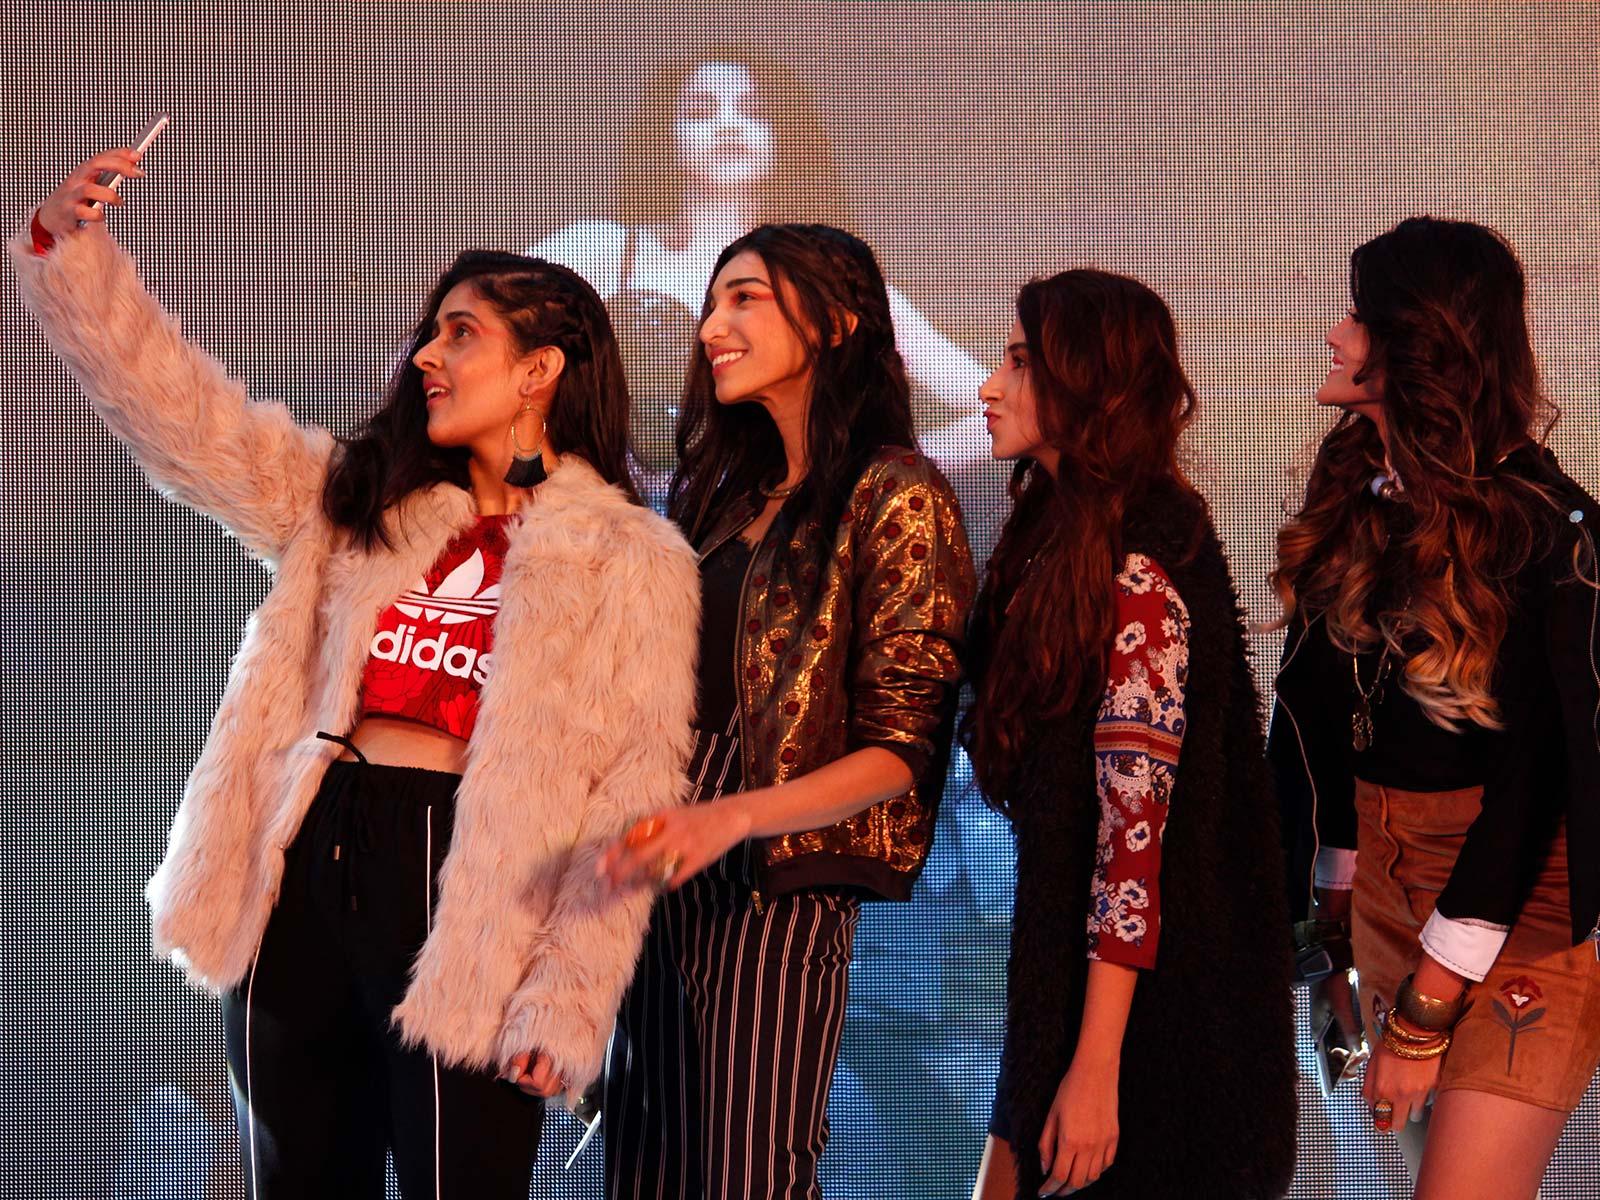 Shreya Kalra, Juhi Godambe, Aashna Shroff and Shivani Patil Srishti Singh, Nilu Yuleena Thapa, Aleena Macker and Aien Jamir at the POPxo Big Fab Fest held at Qla in Delhi